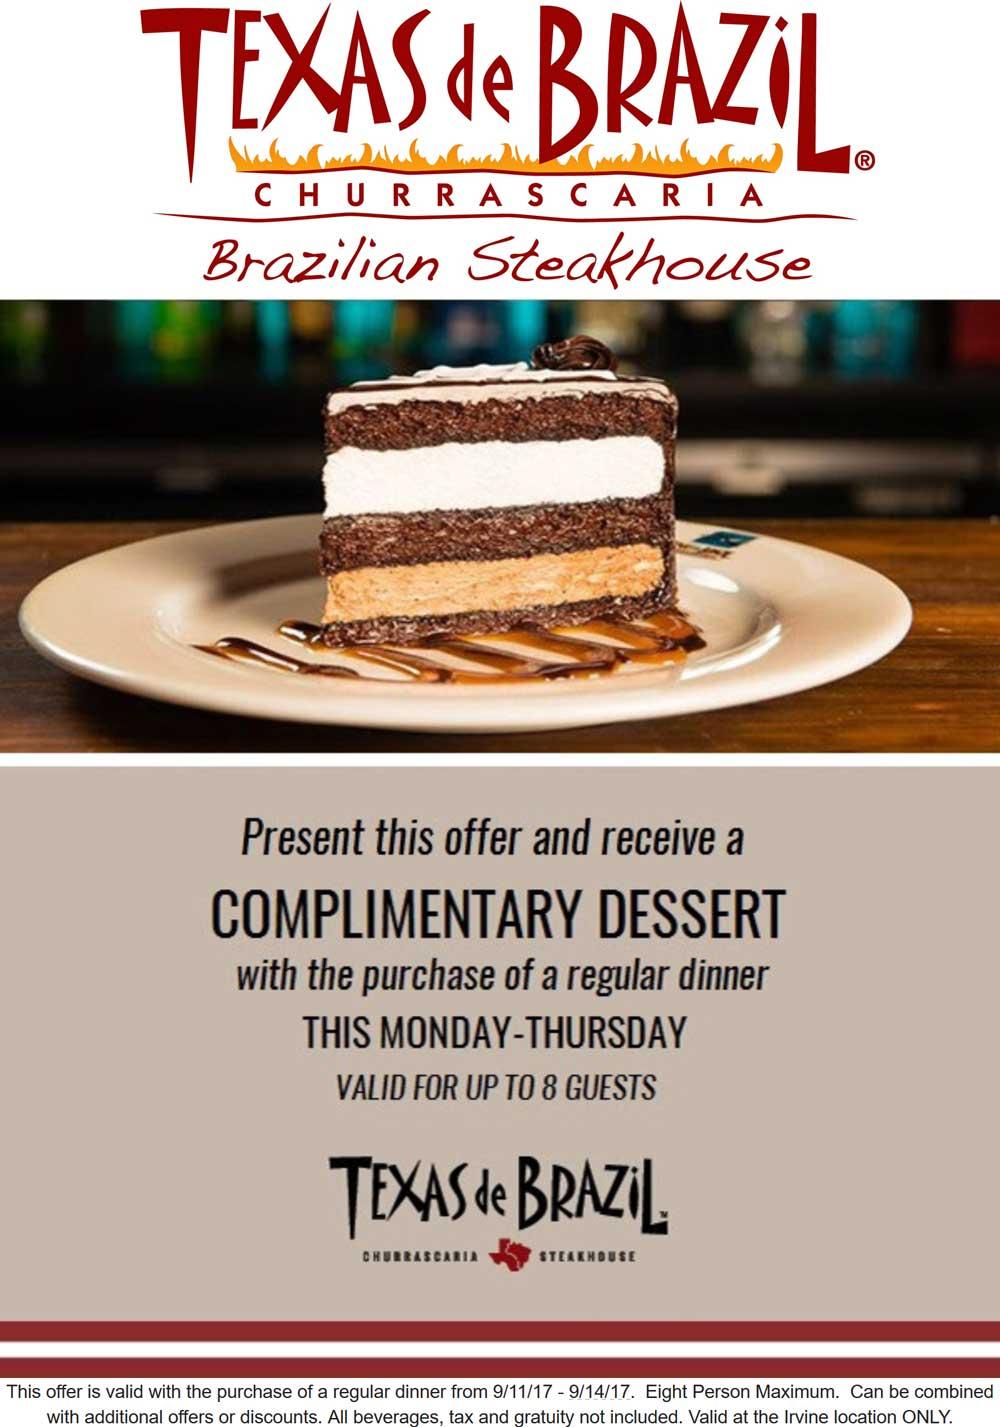 Texas de Brazil Coupon December 2018 Free dessert with your dinner at Texas de Brazil